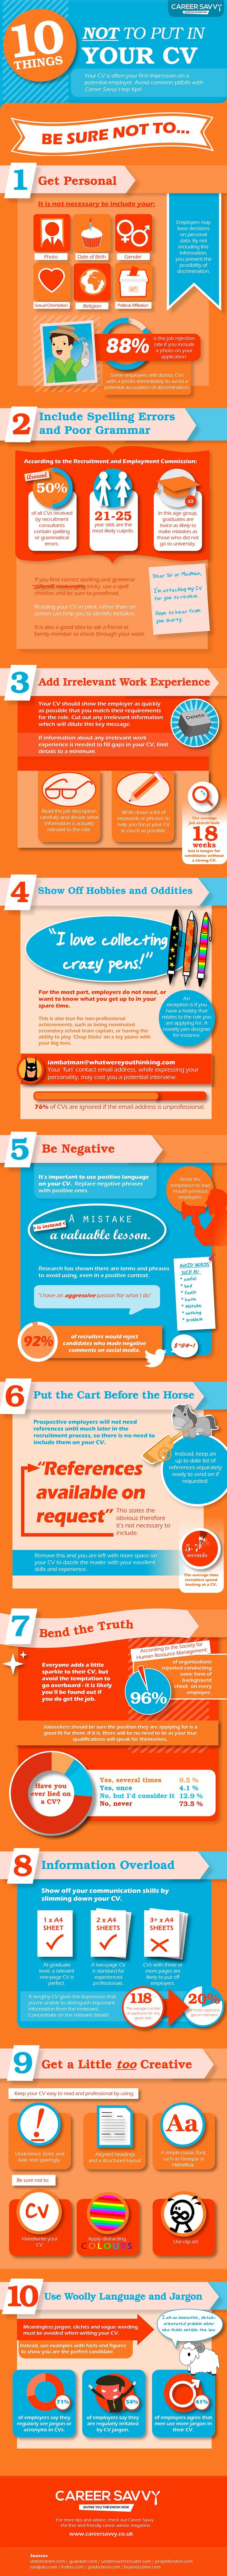 10 cosas que NO poner en tu Curriculum #infografia #infographic #rrhh #empleo